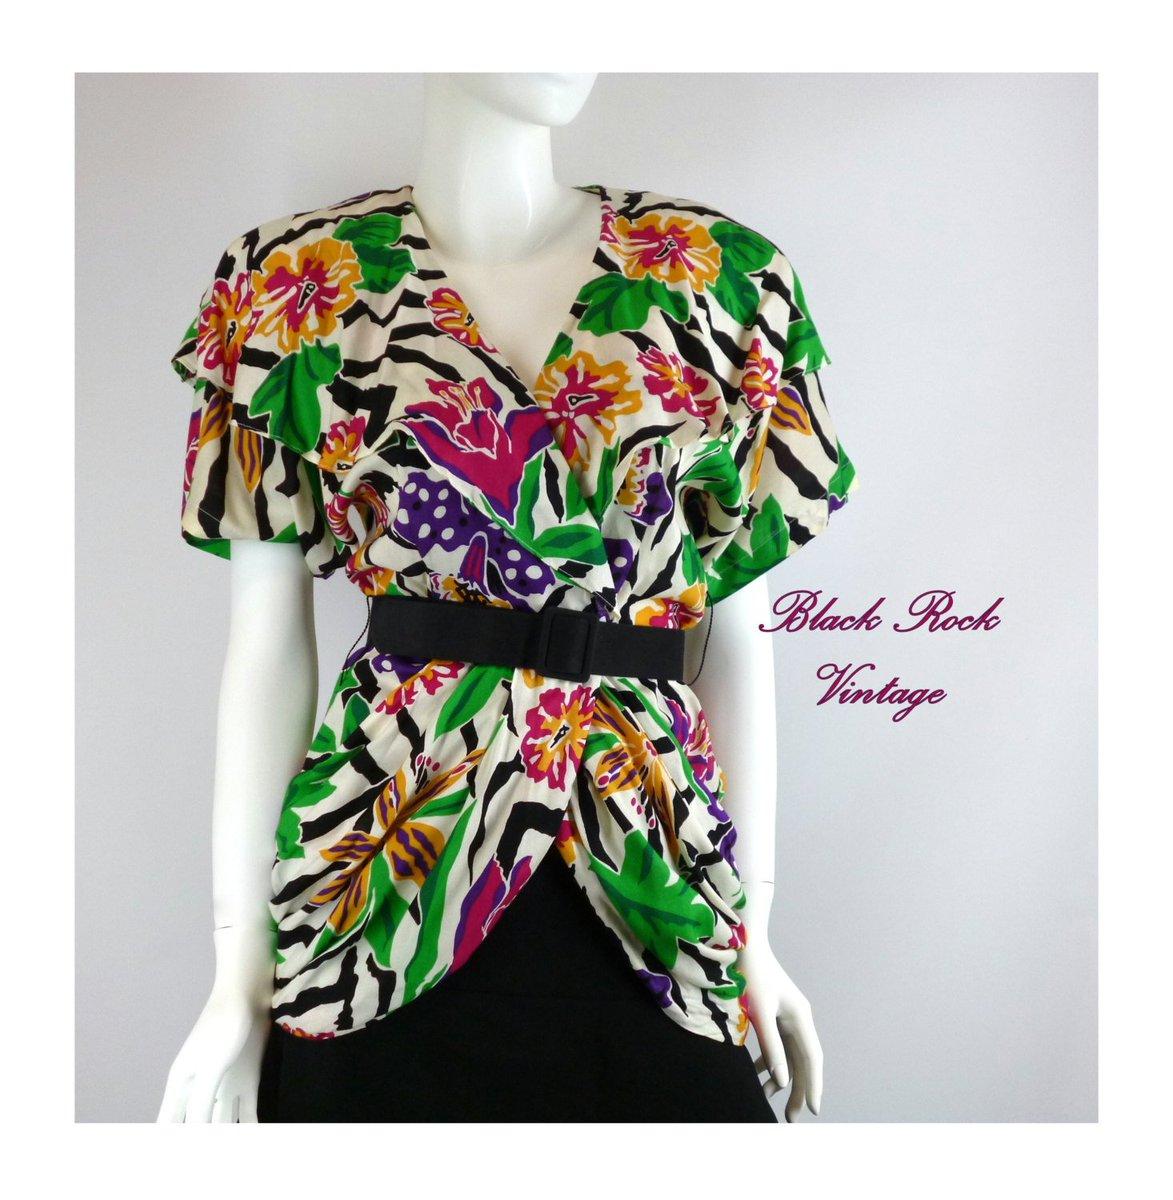 Floral Jacket Tropical Print, Jewel Tones Shawl Collar, Vinta… http://etsy.me/2rvVE76 #VintageDresses #DrapedBlouse pic.twitter.com/mDWqtWTgfu